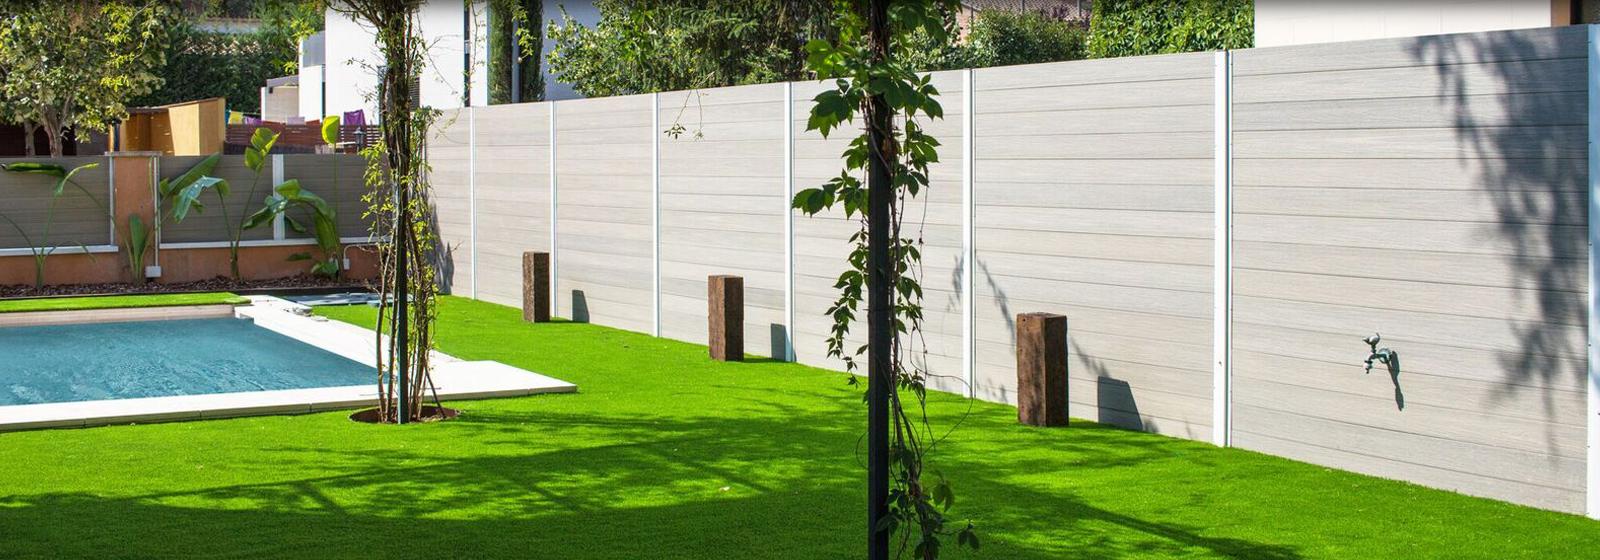 Serveis integrals de jardineria i paisatgisme jardineria for Jardineria sabadell